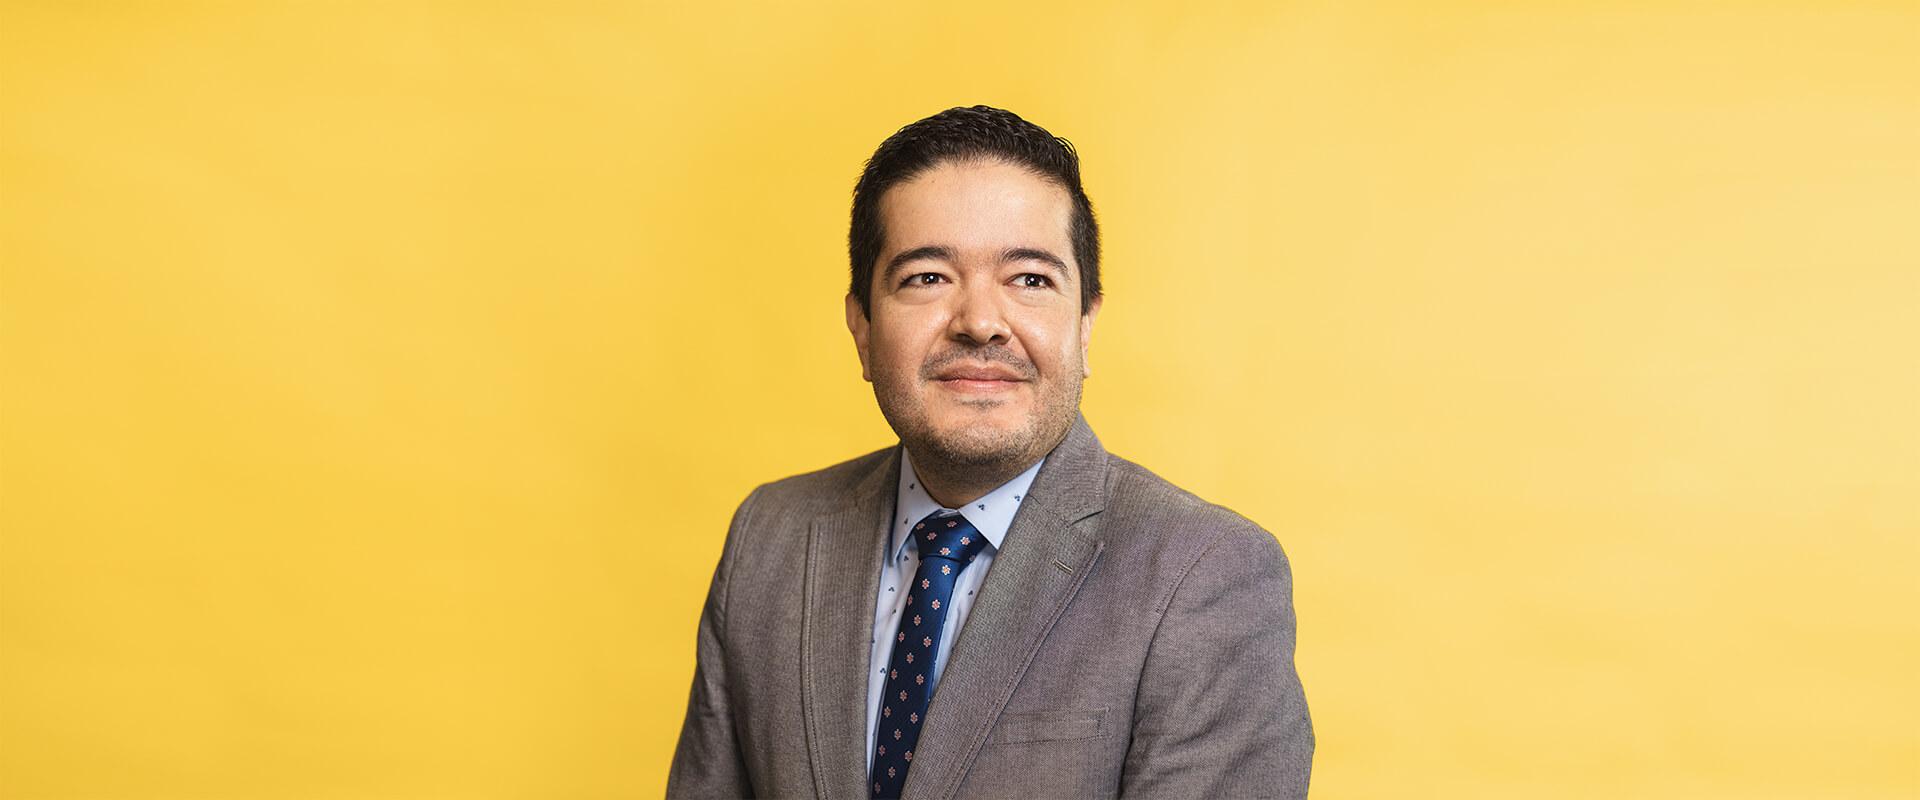 Juan Ocampo